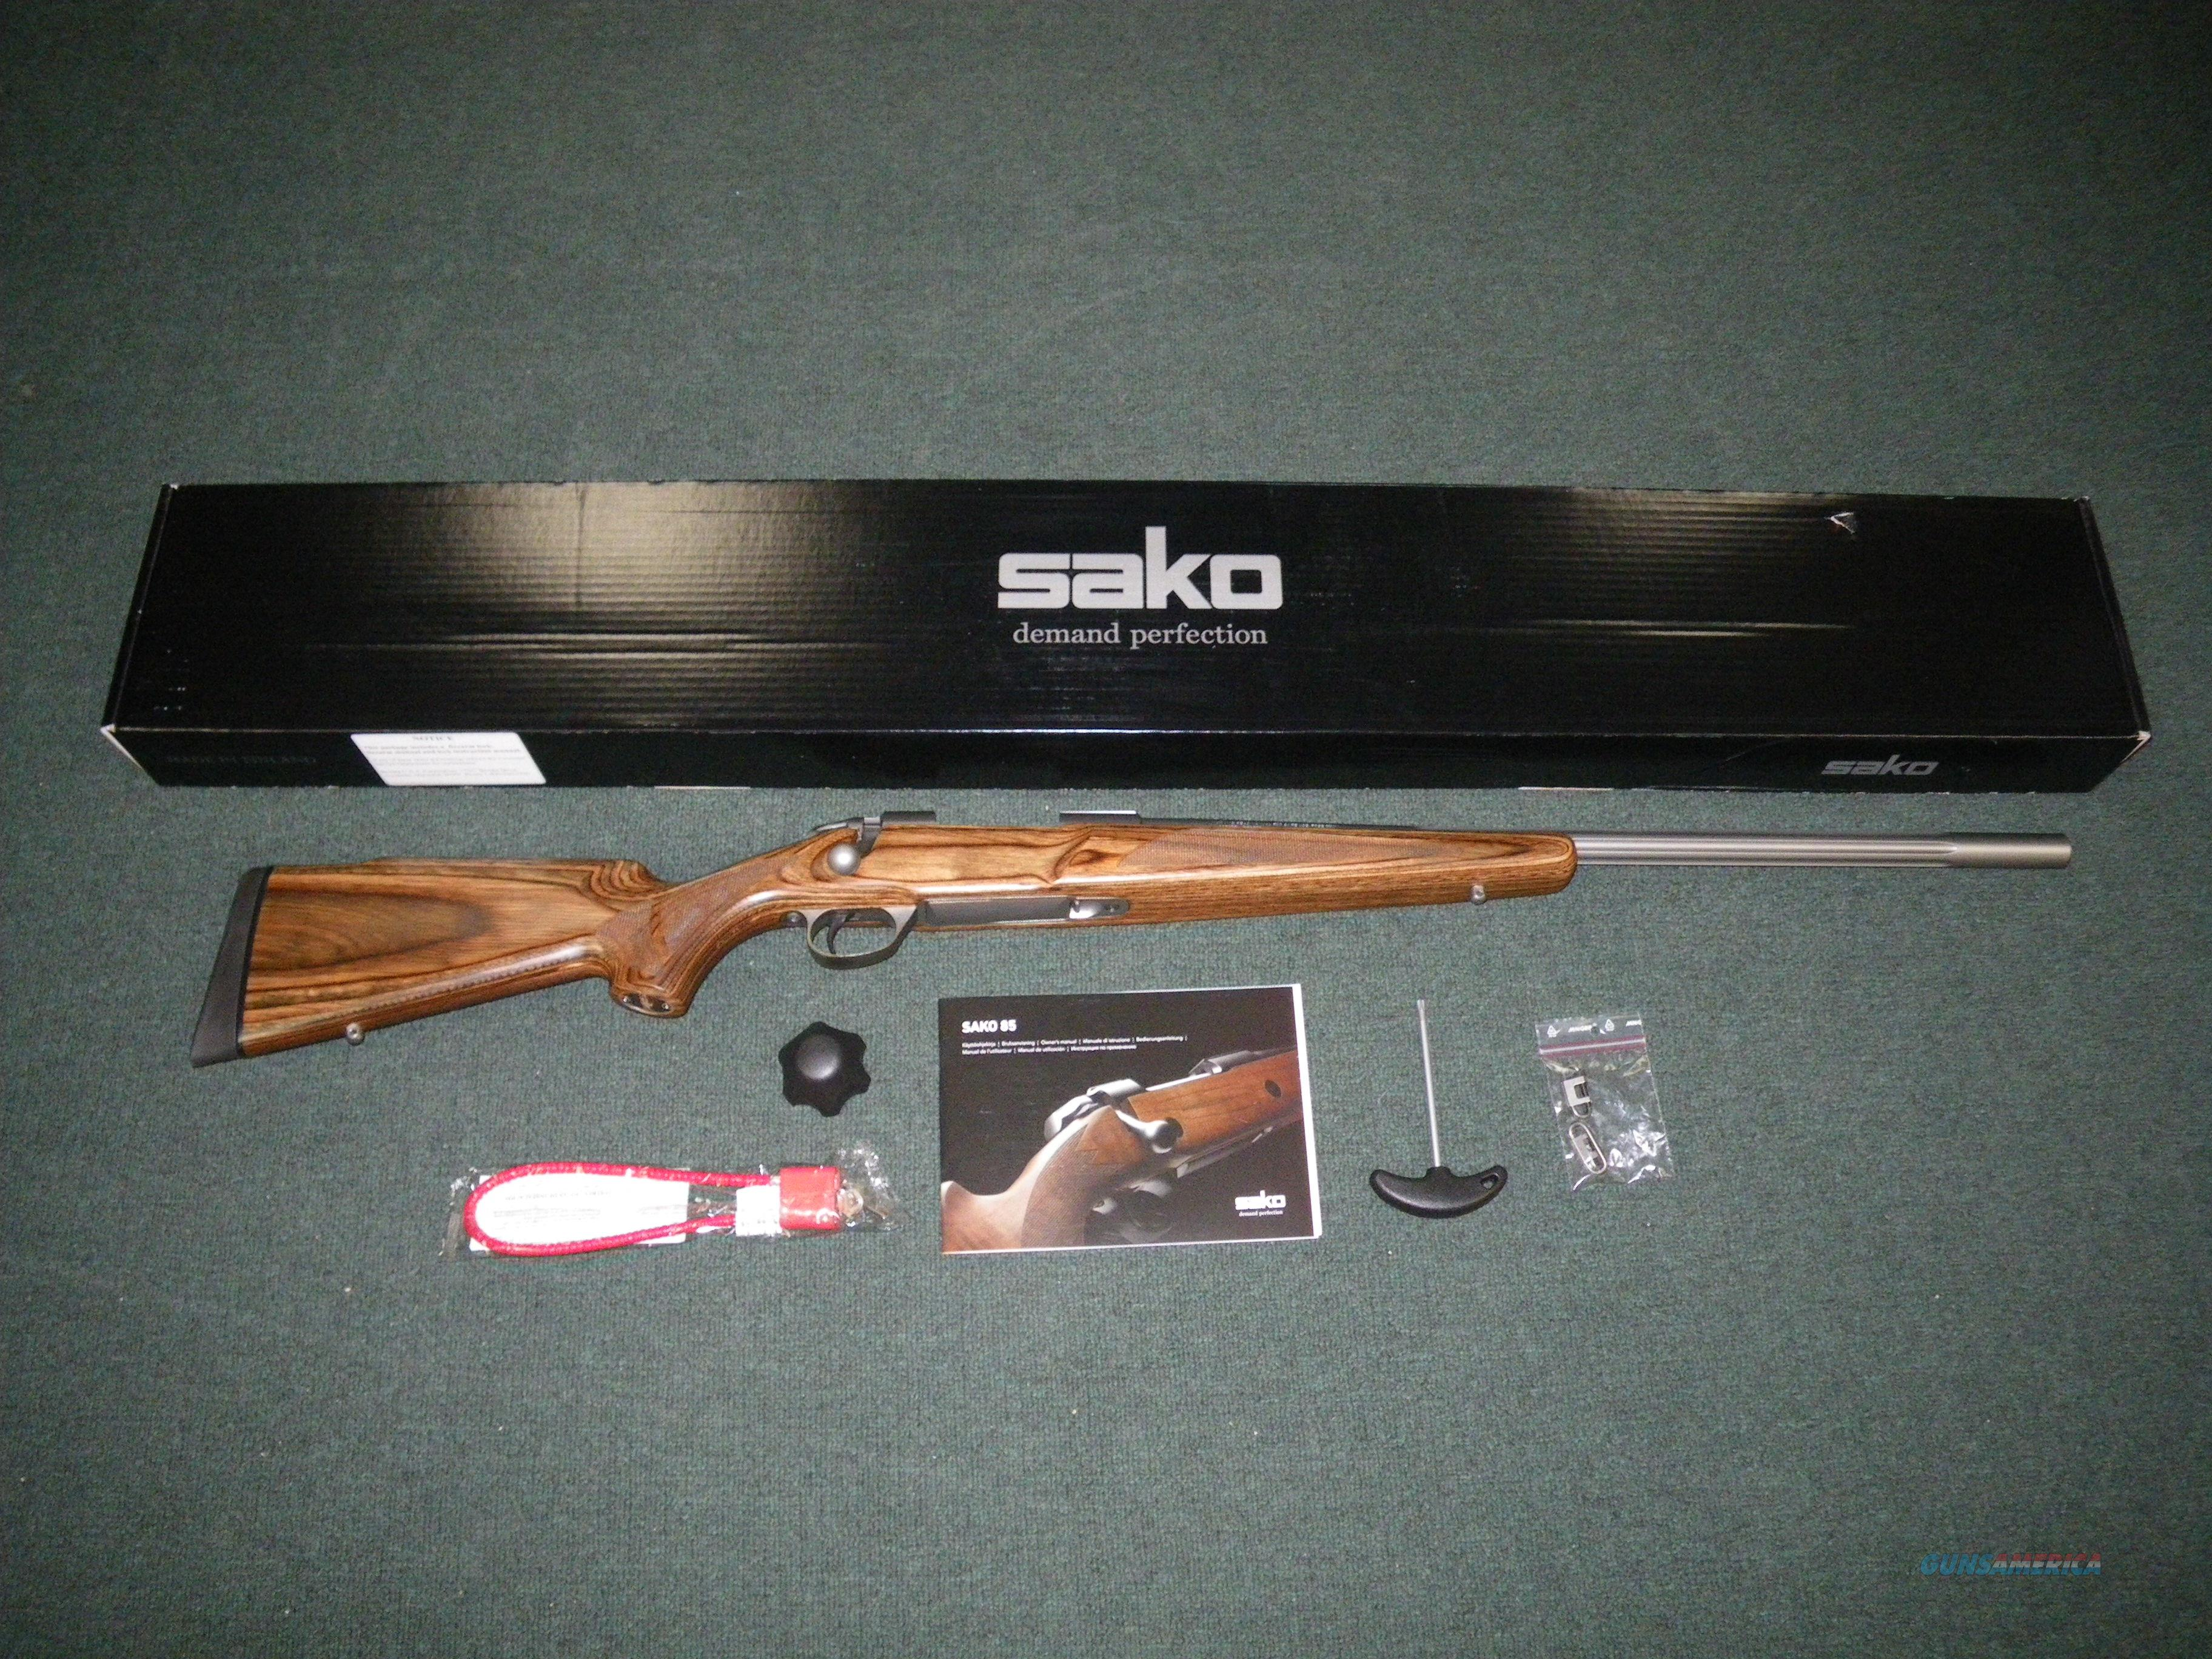 "Sako 85 Varmint Stainless 22-250 23.6"" Fluted NEW #JRS1G14  Guns > Rifles > Sako Rifles > M85 Series"